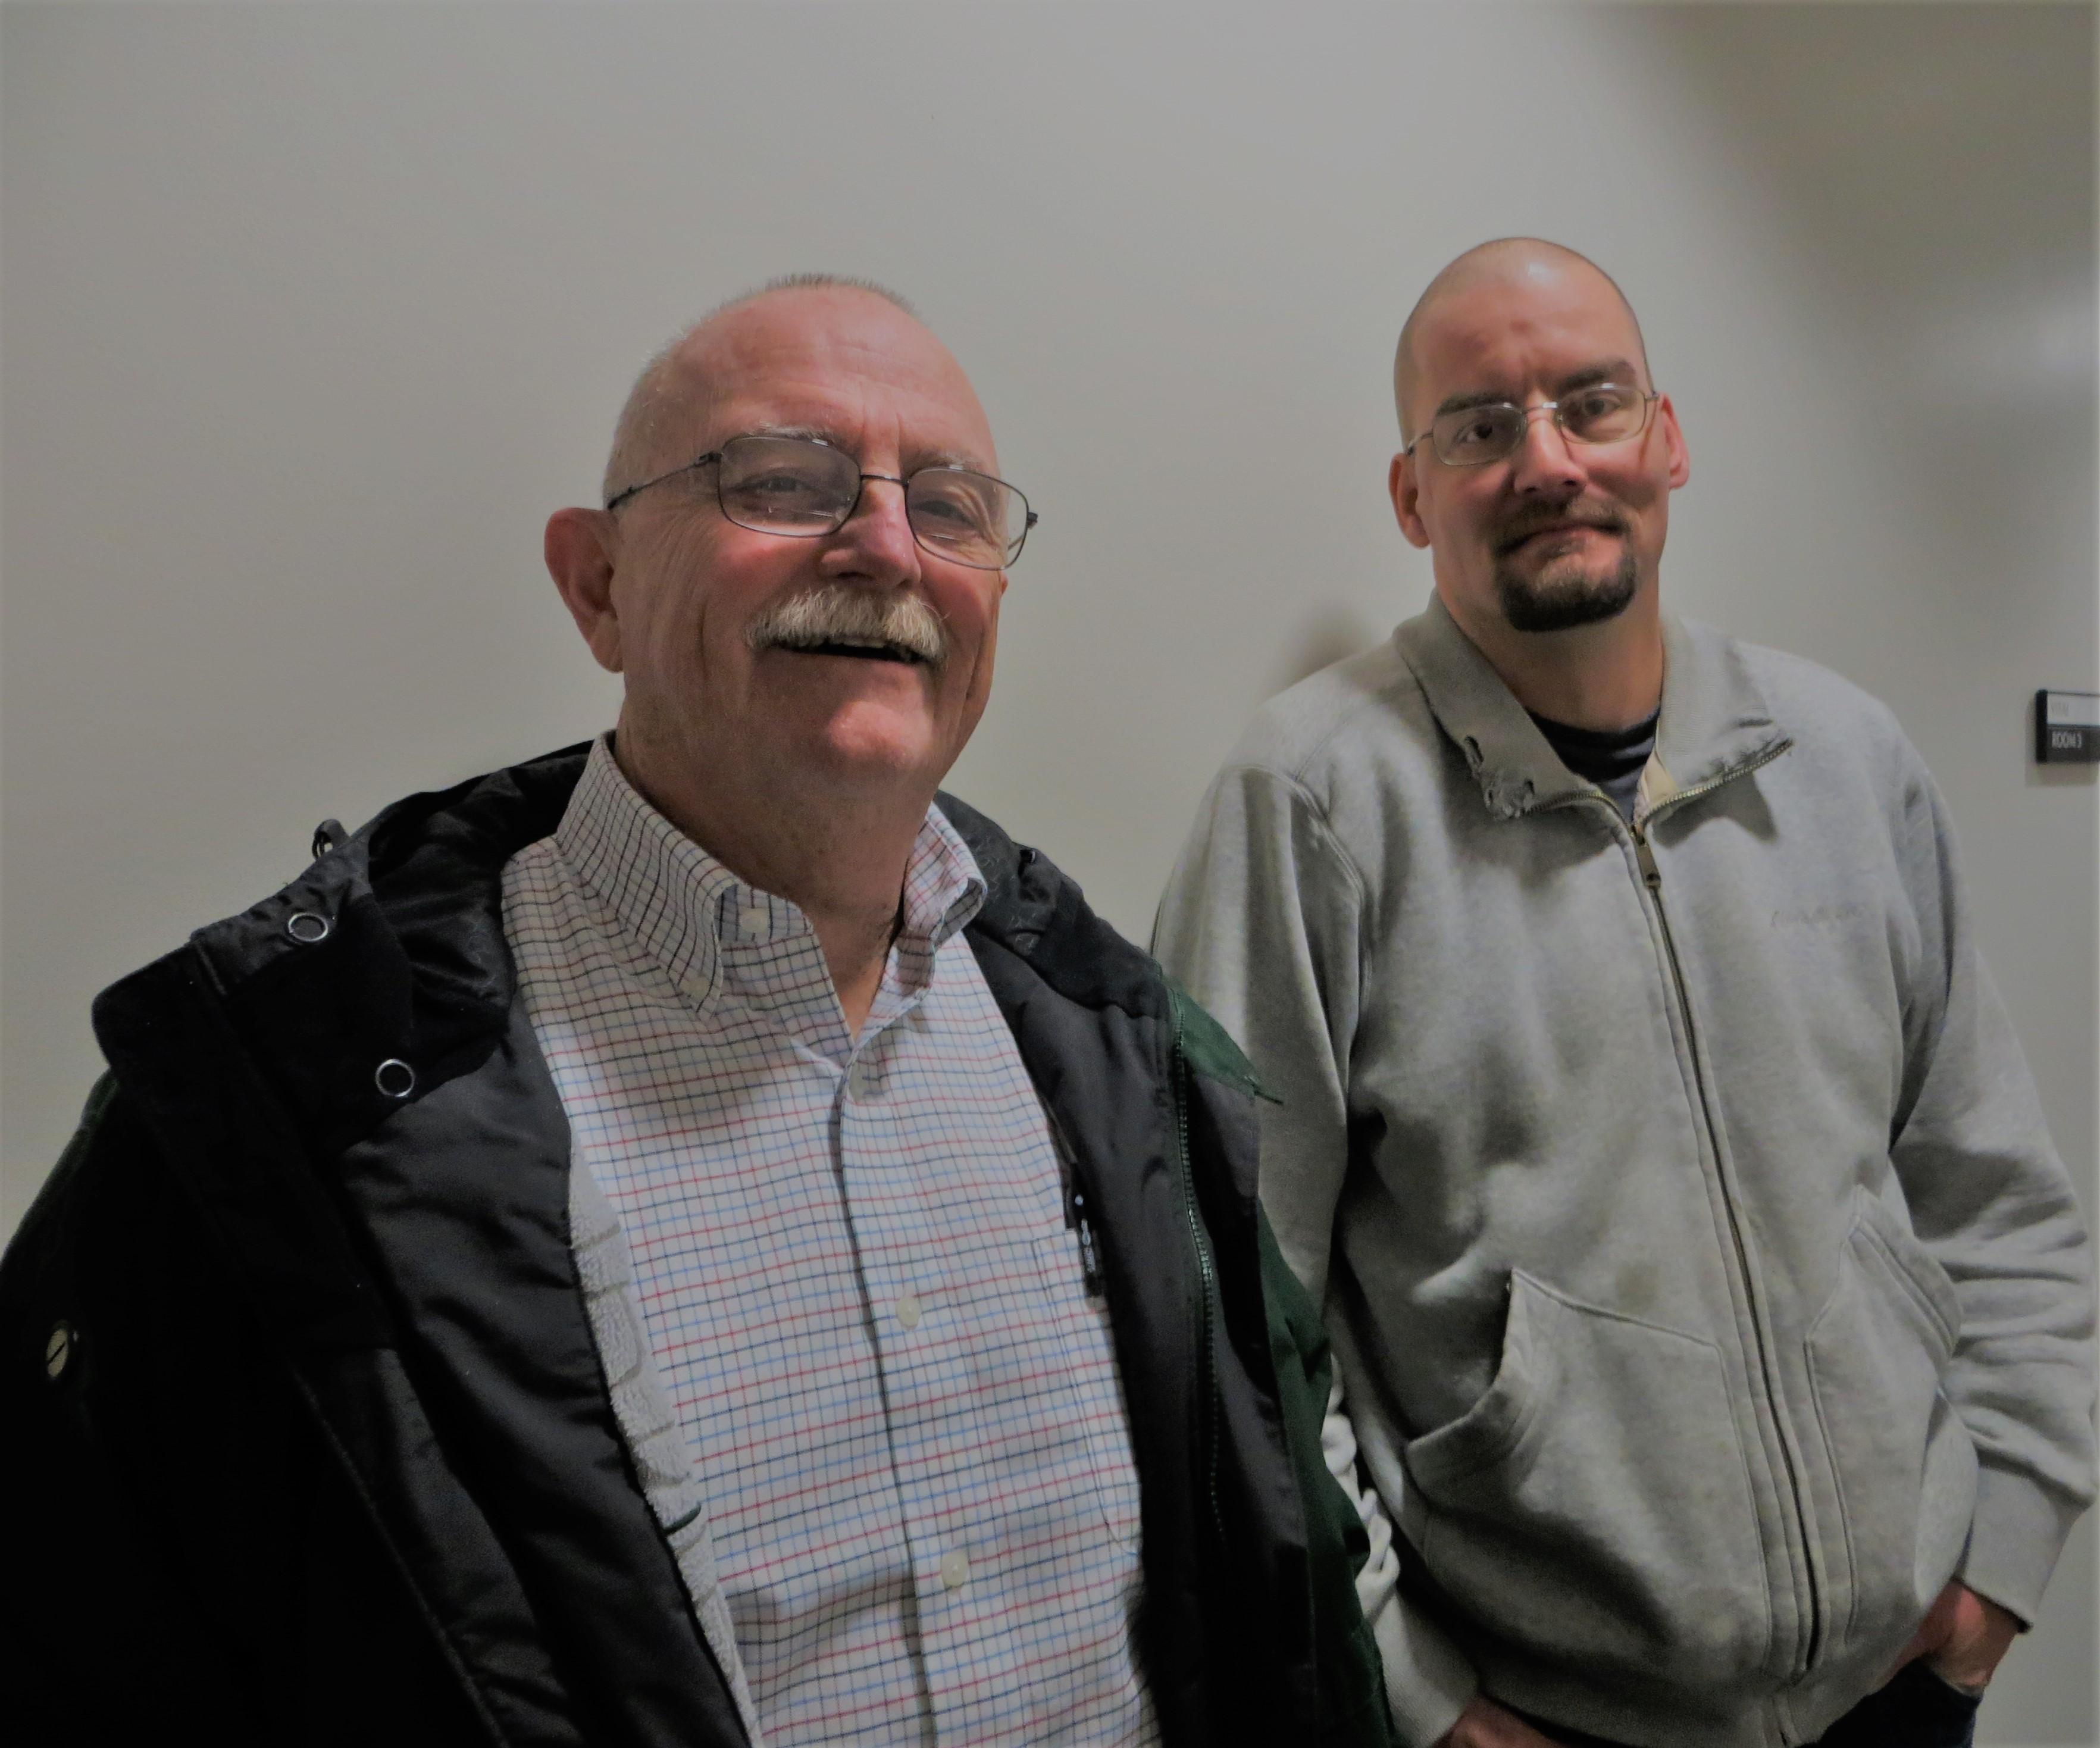 Dennis Davoren and learner Adam Garmon